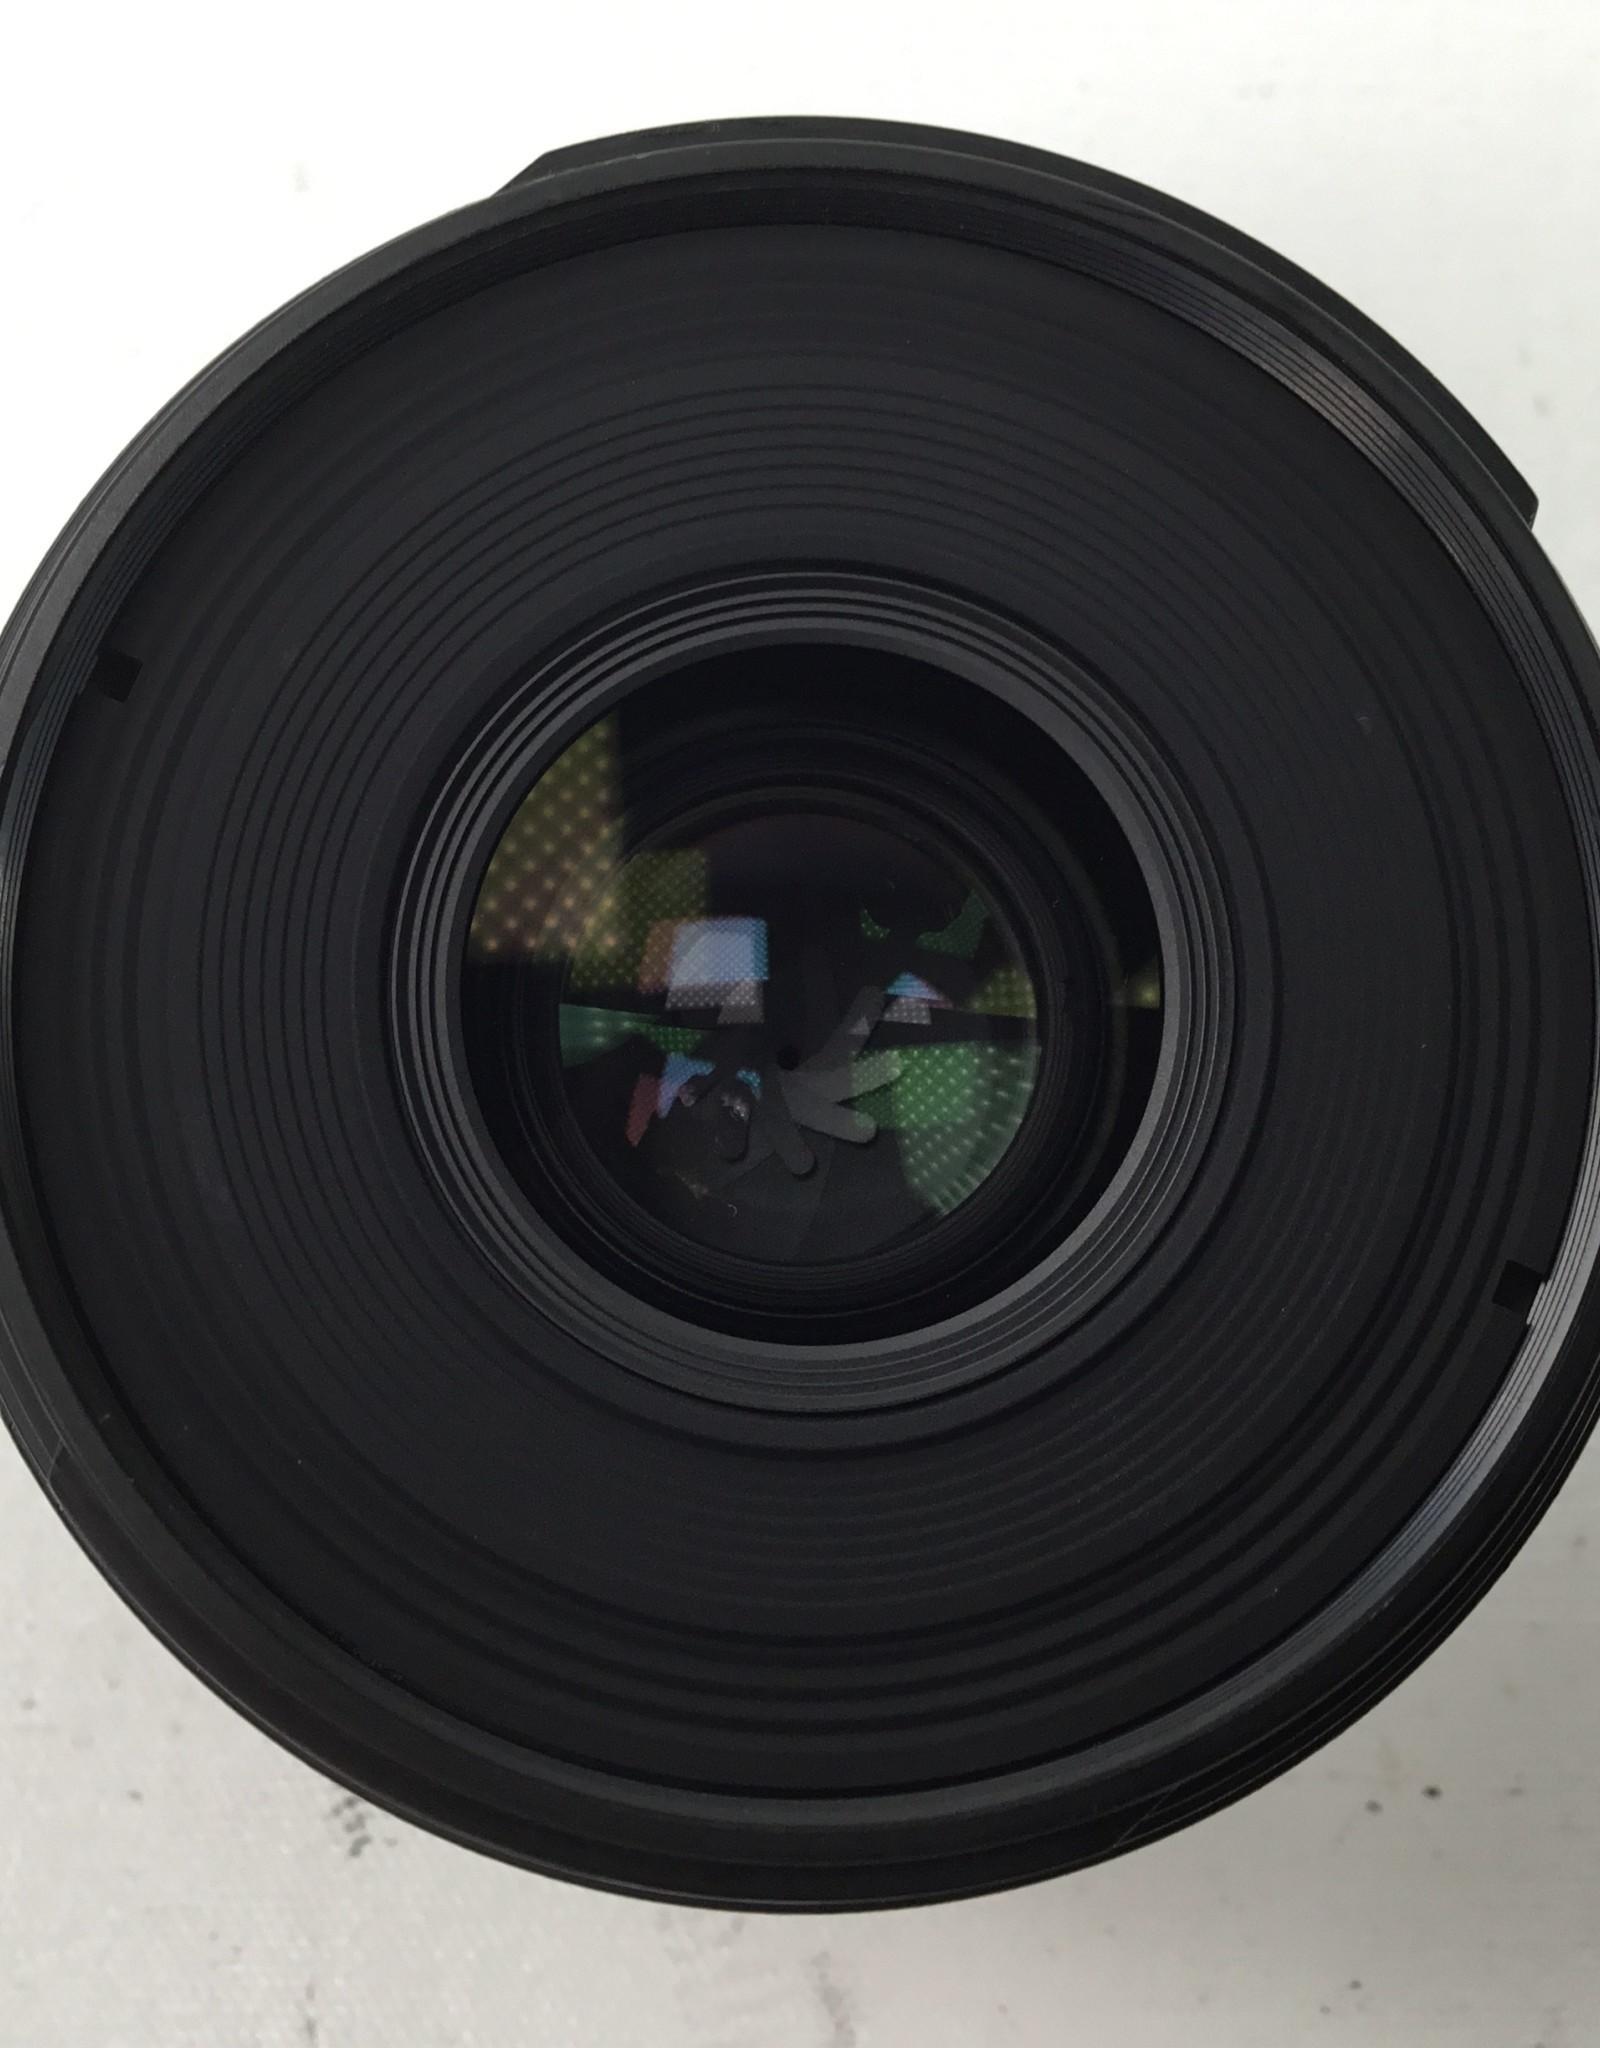 NIKON Nikon AF-S Micro Nikkor 60mm f2.8 G Lens Used Good